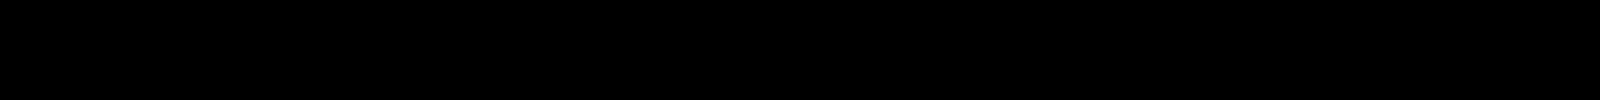 16x16 (Tag) | FontStruct